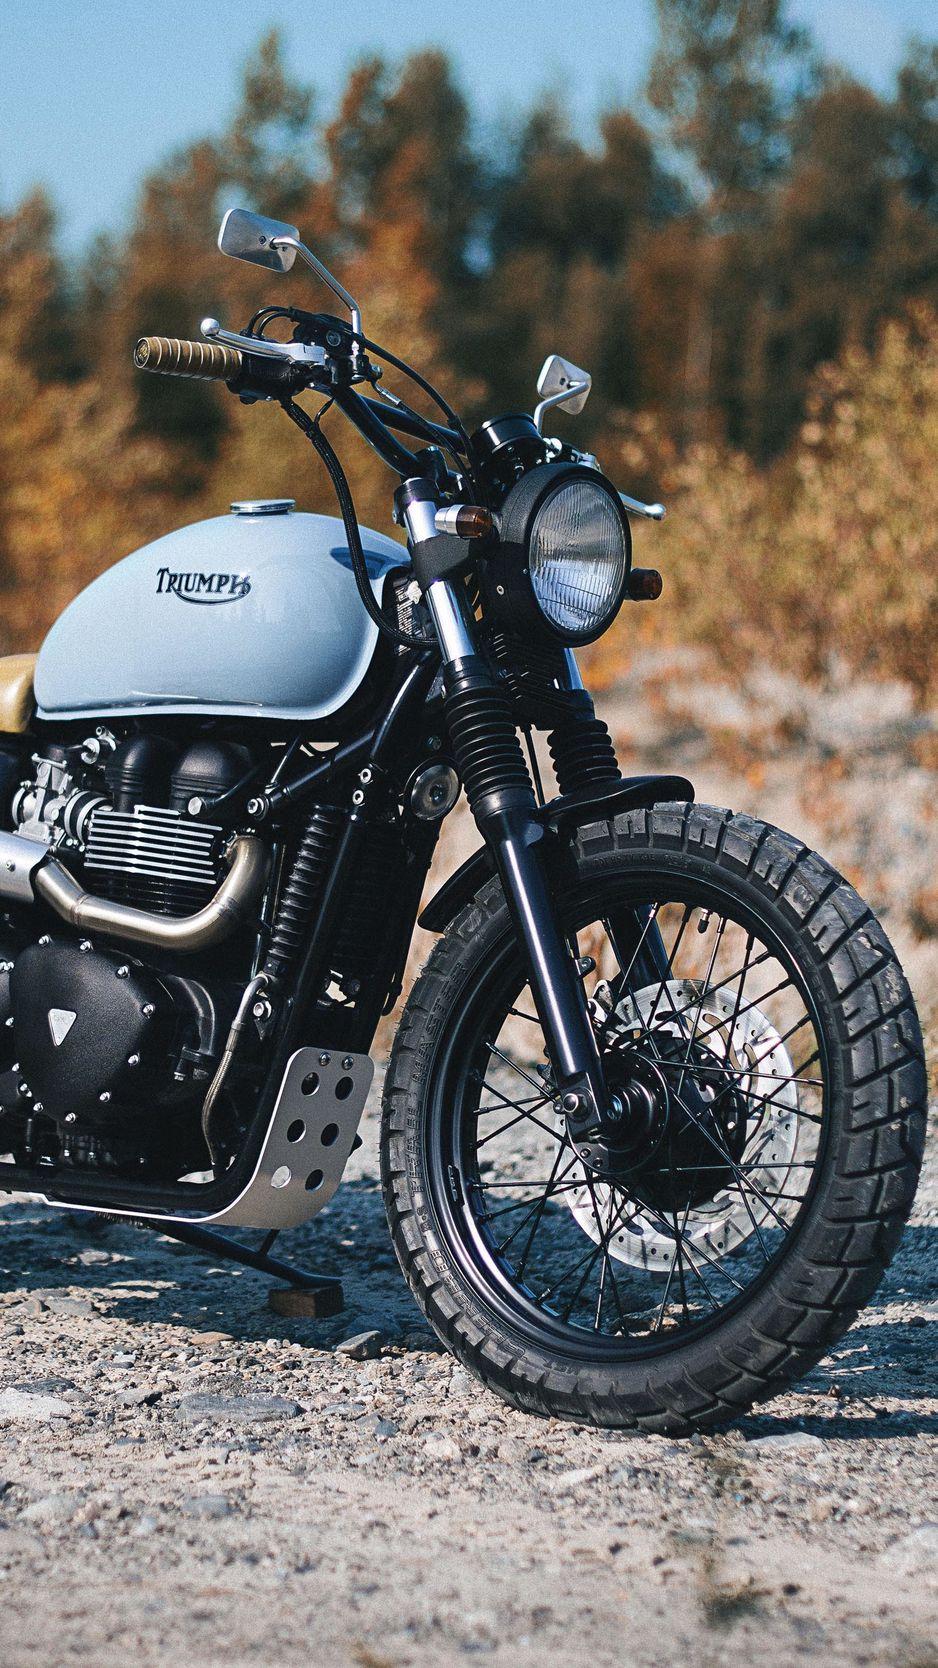 938x1668 Обои triumph, bonneville, мотоцикл, вид сбоку